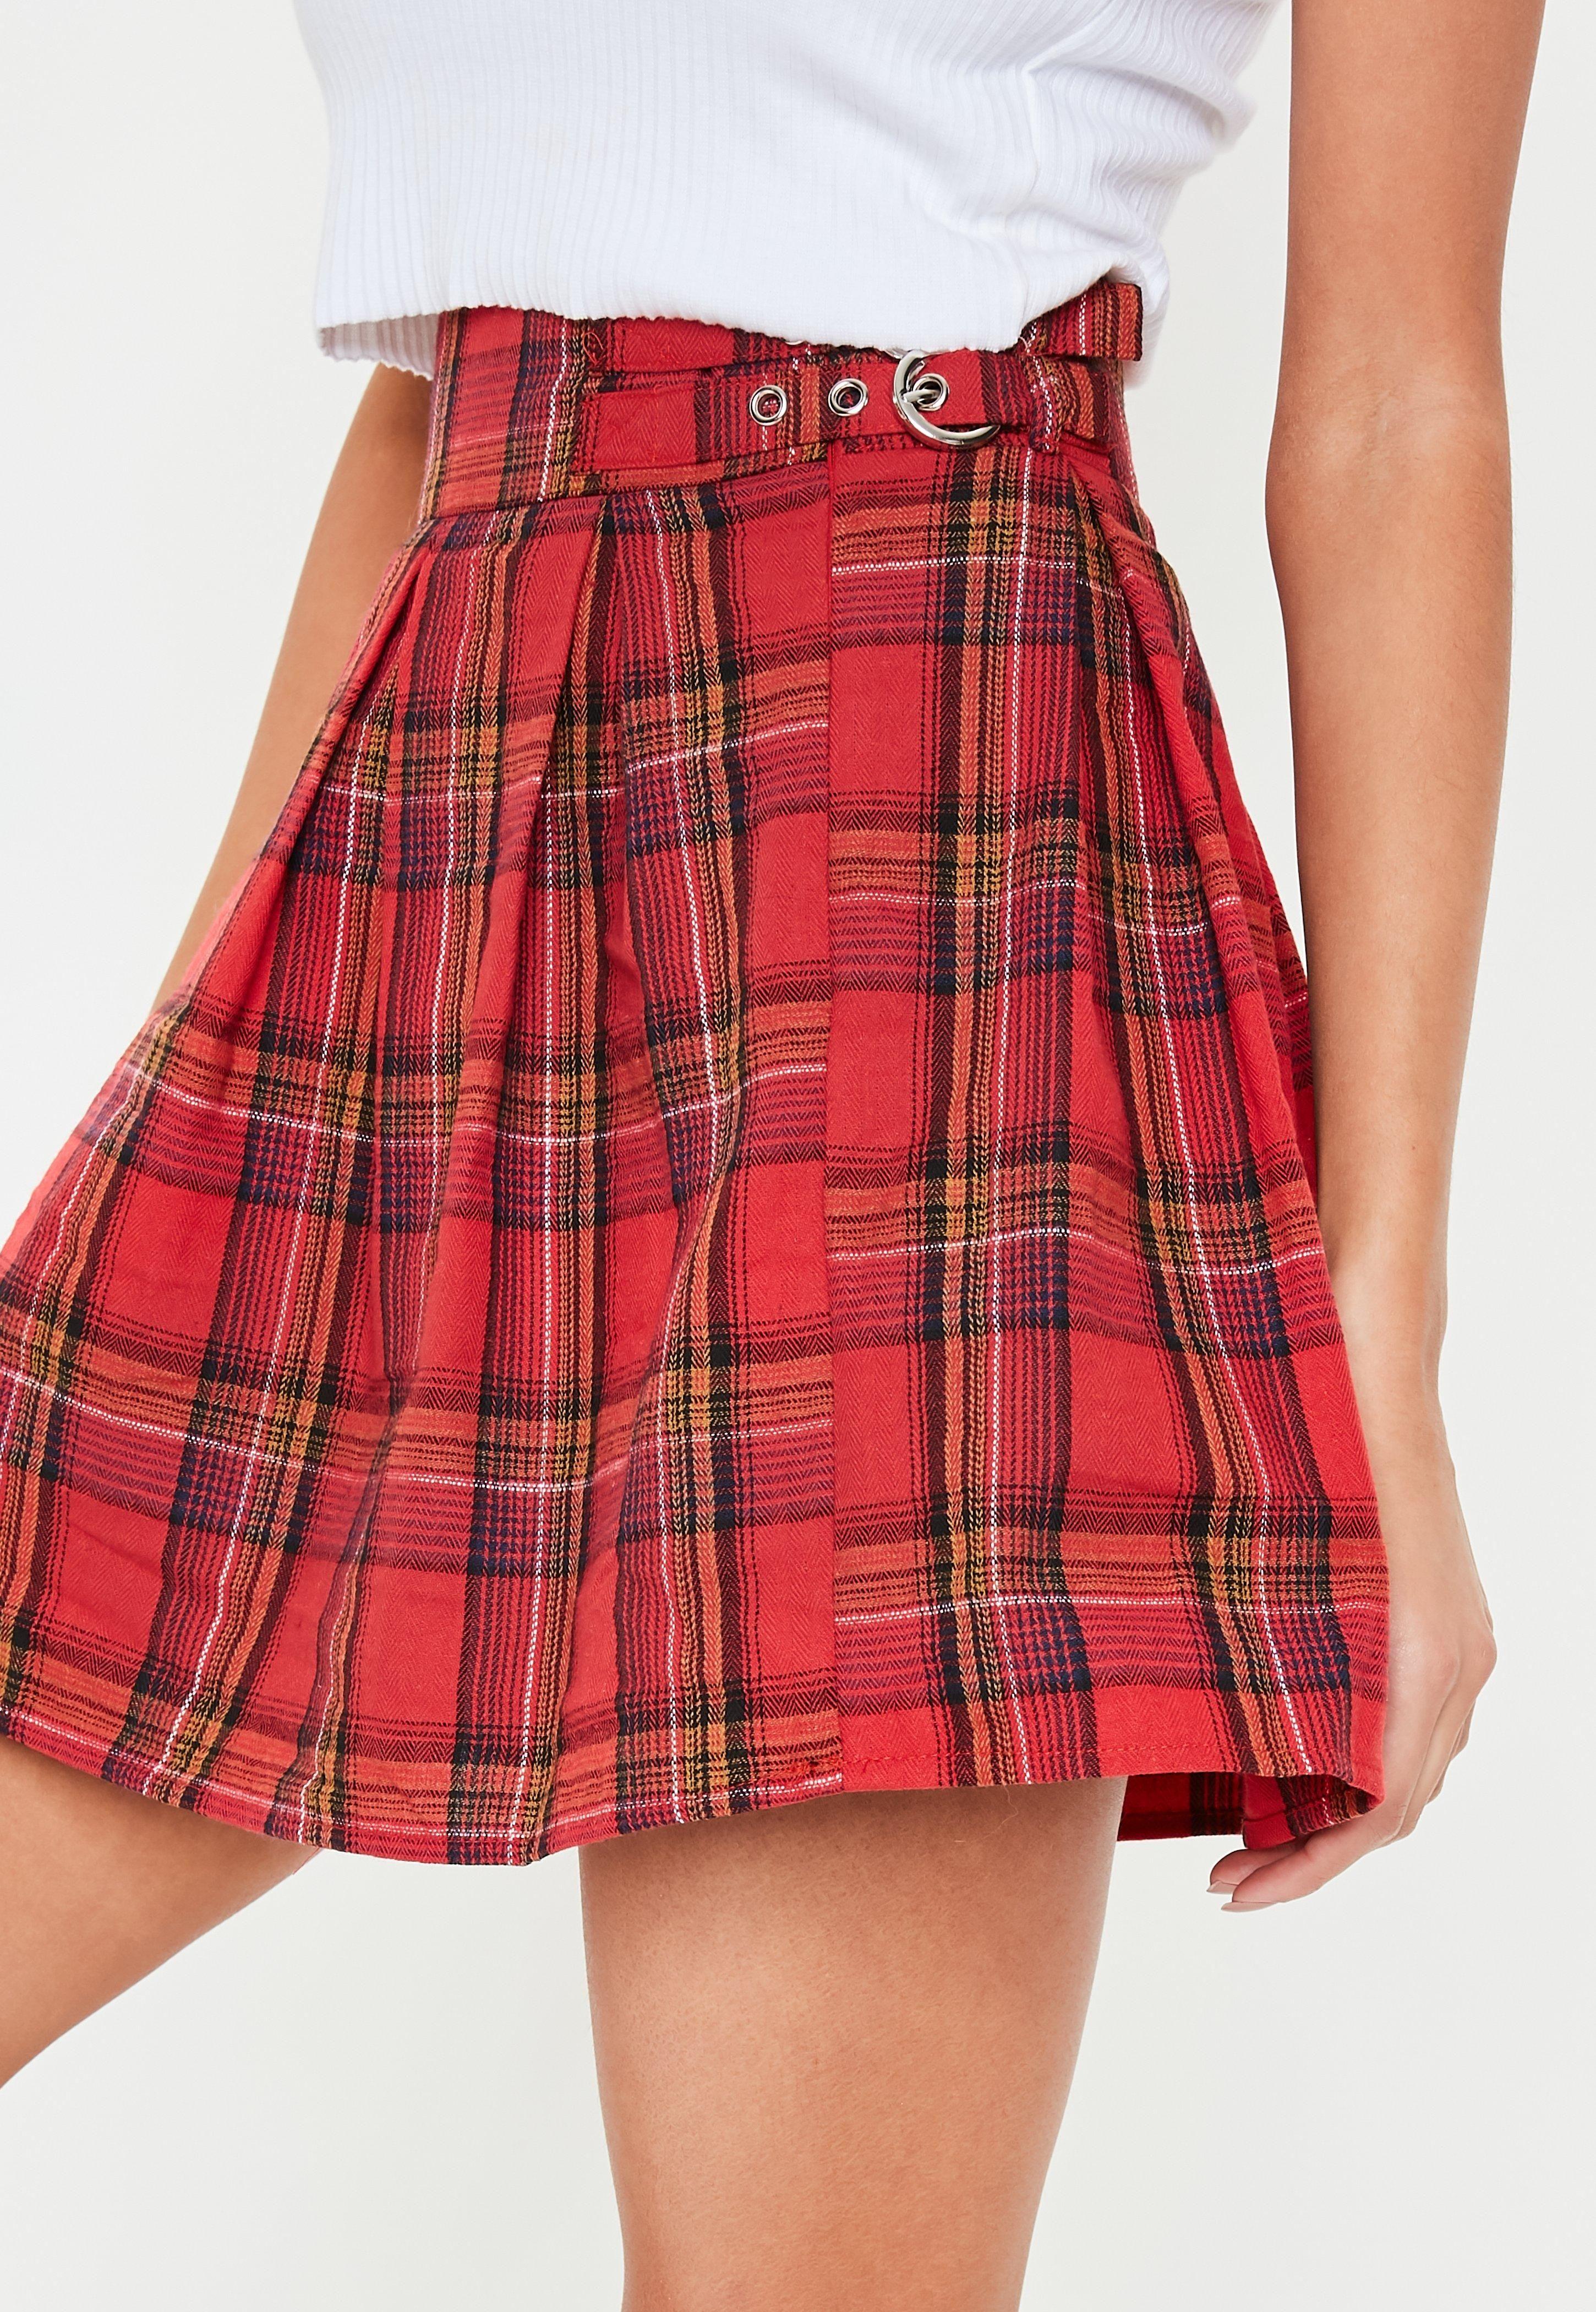 5da9a6409a Red Plaid Print Pleated Buckle Mini Skirt #Sponsored #Print, #sponsored, #